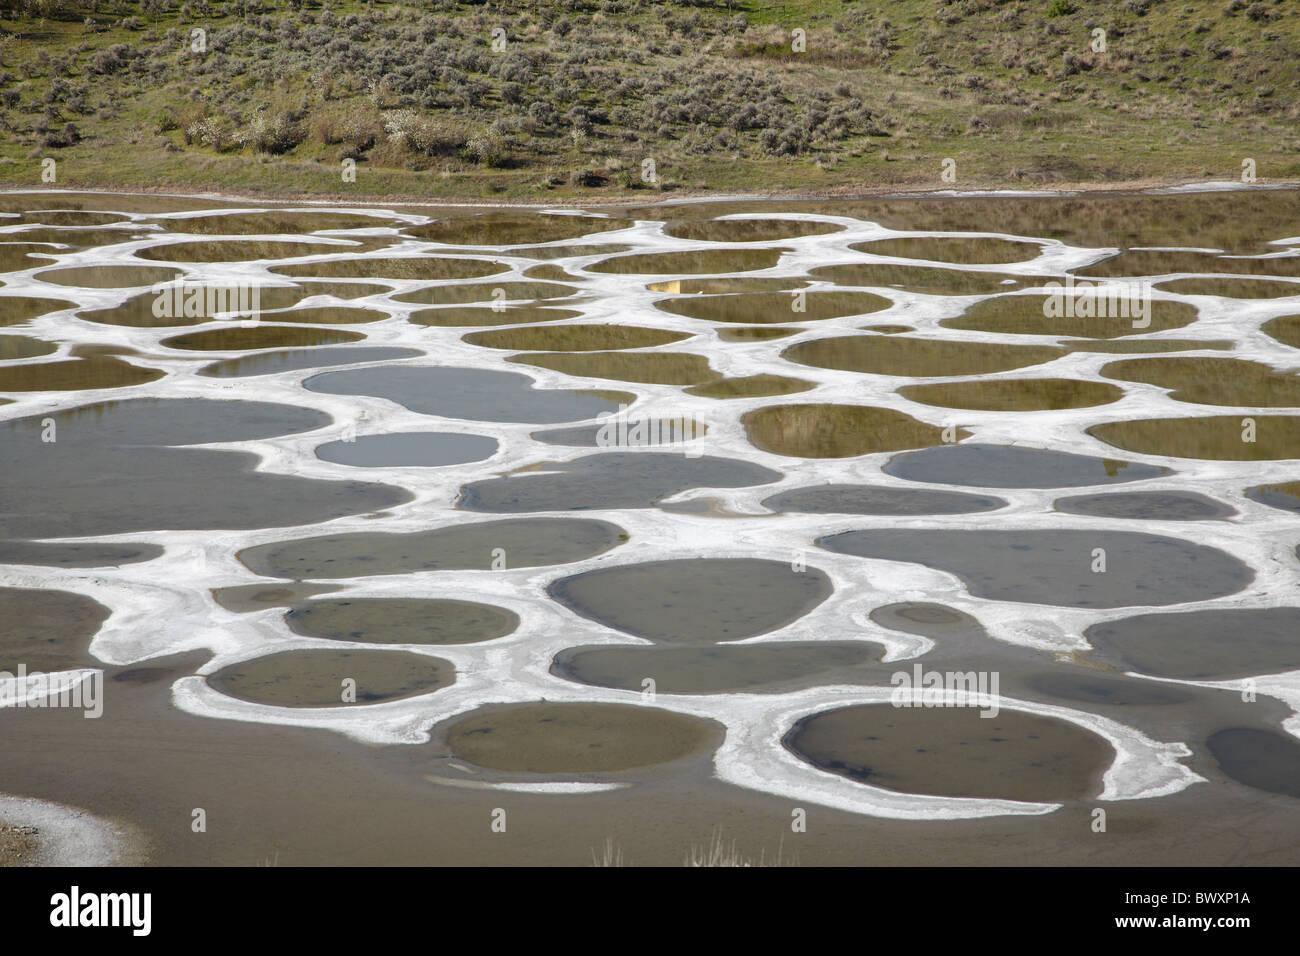 Spotted Lake, Osoyoos, British Columbia, Canada - Stock Image